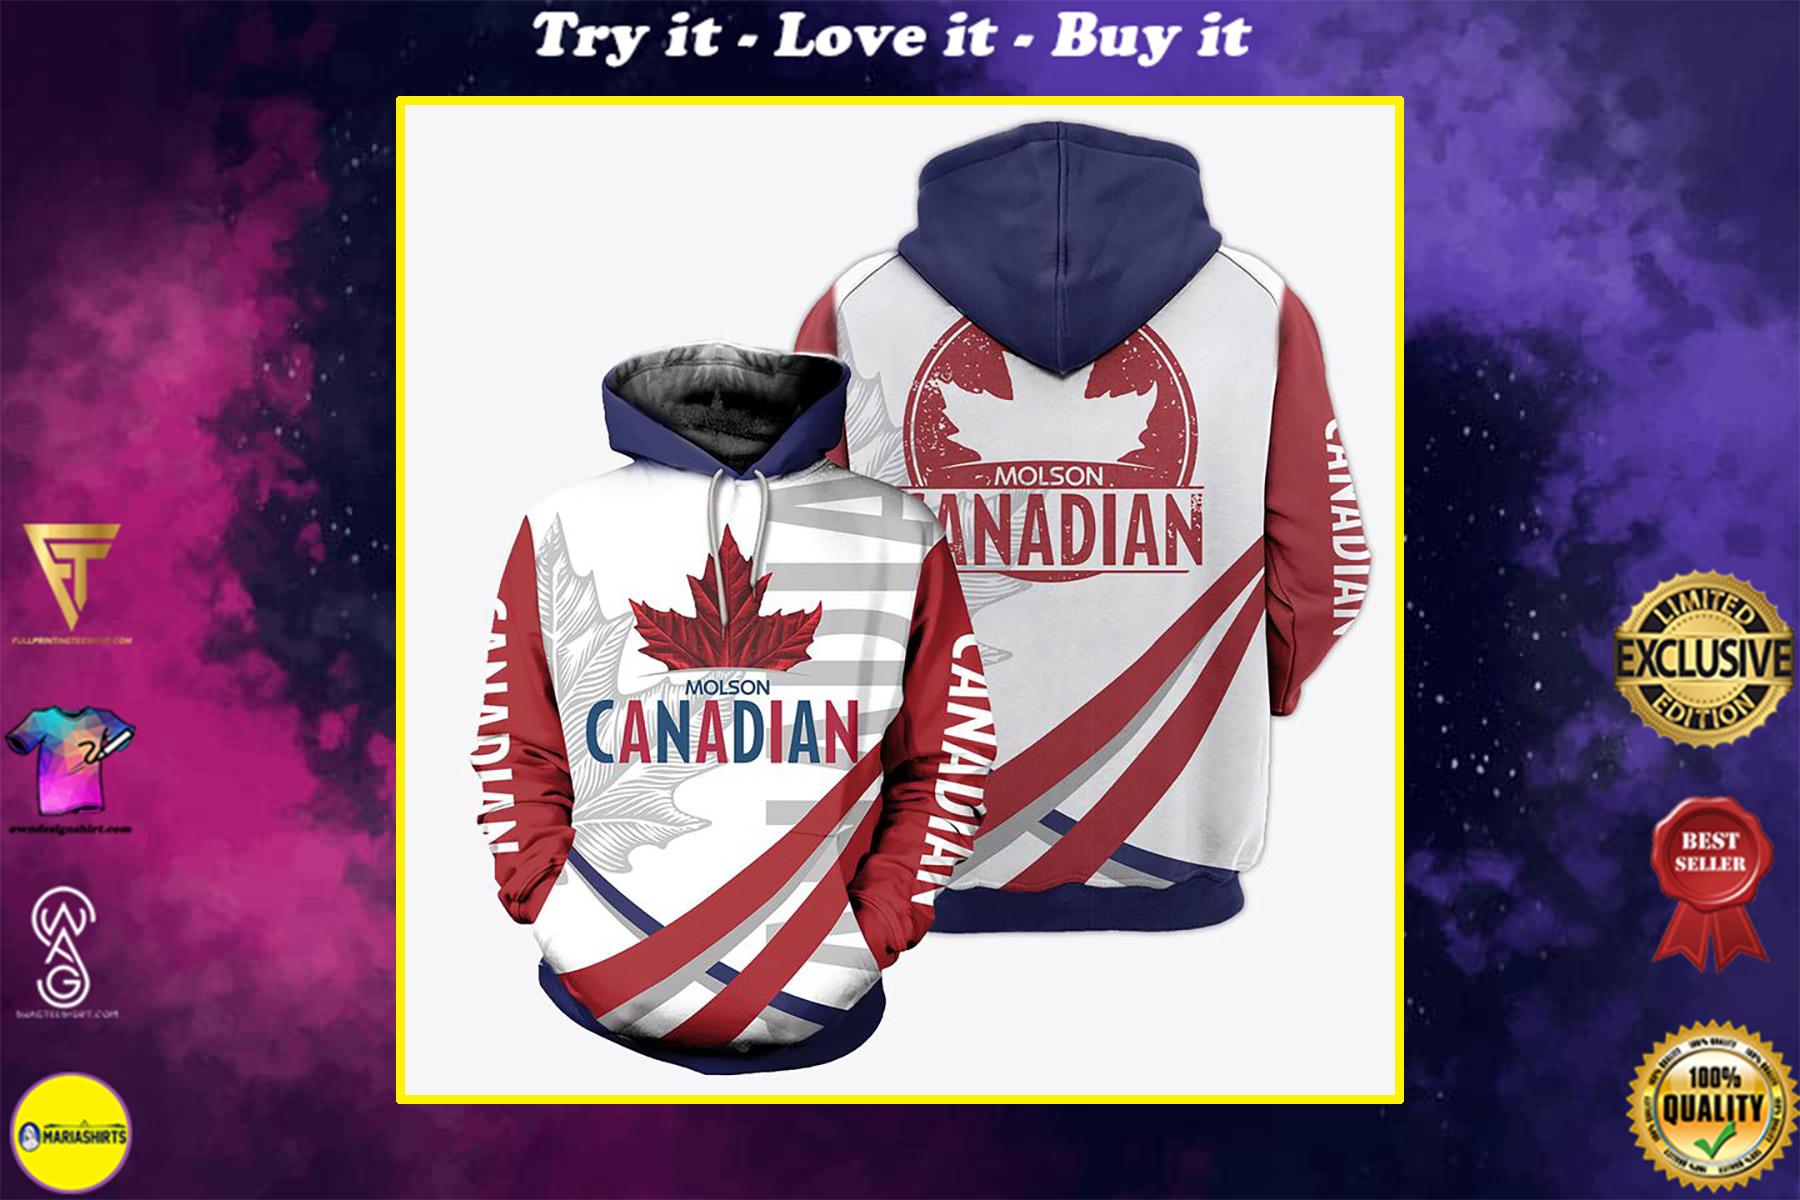 molson canadian sorority full over print shirt